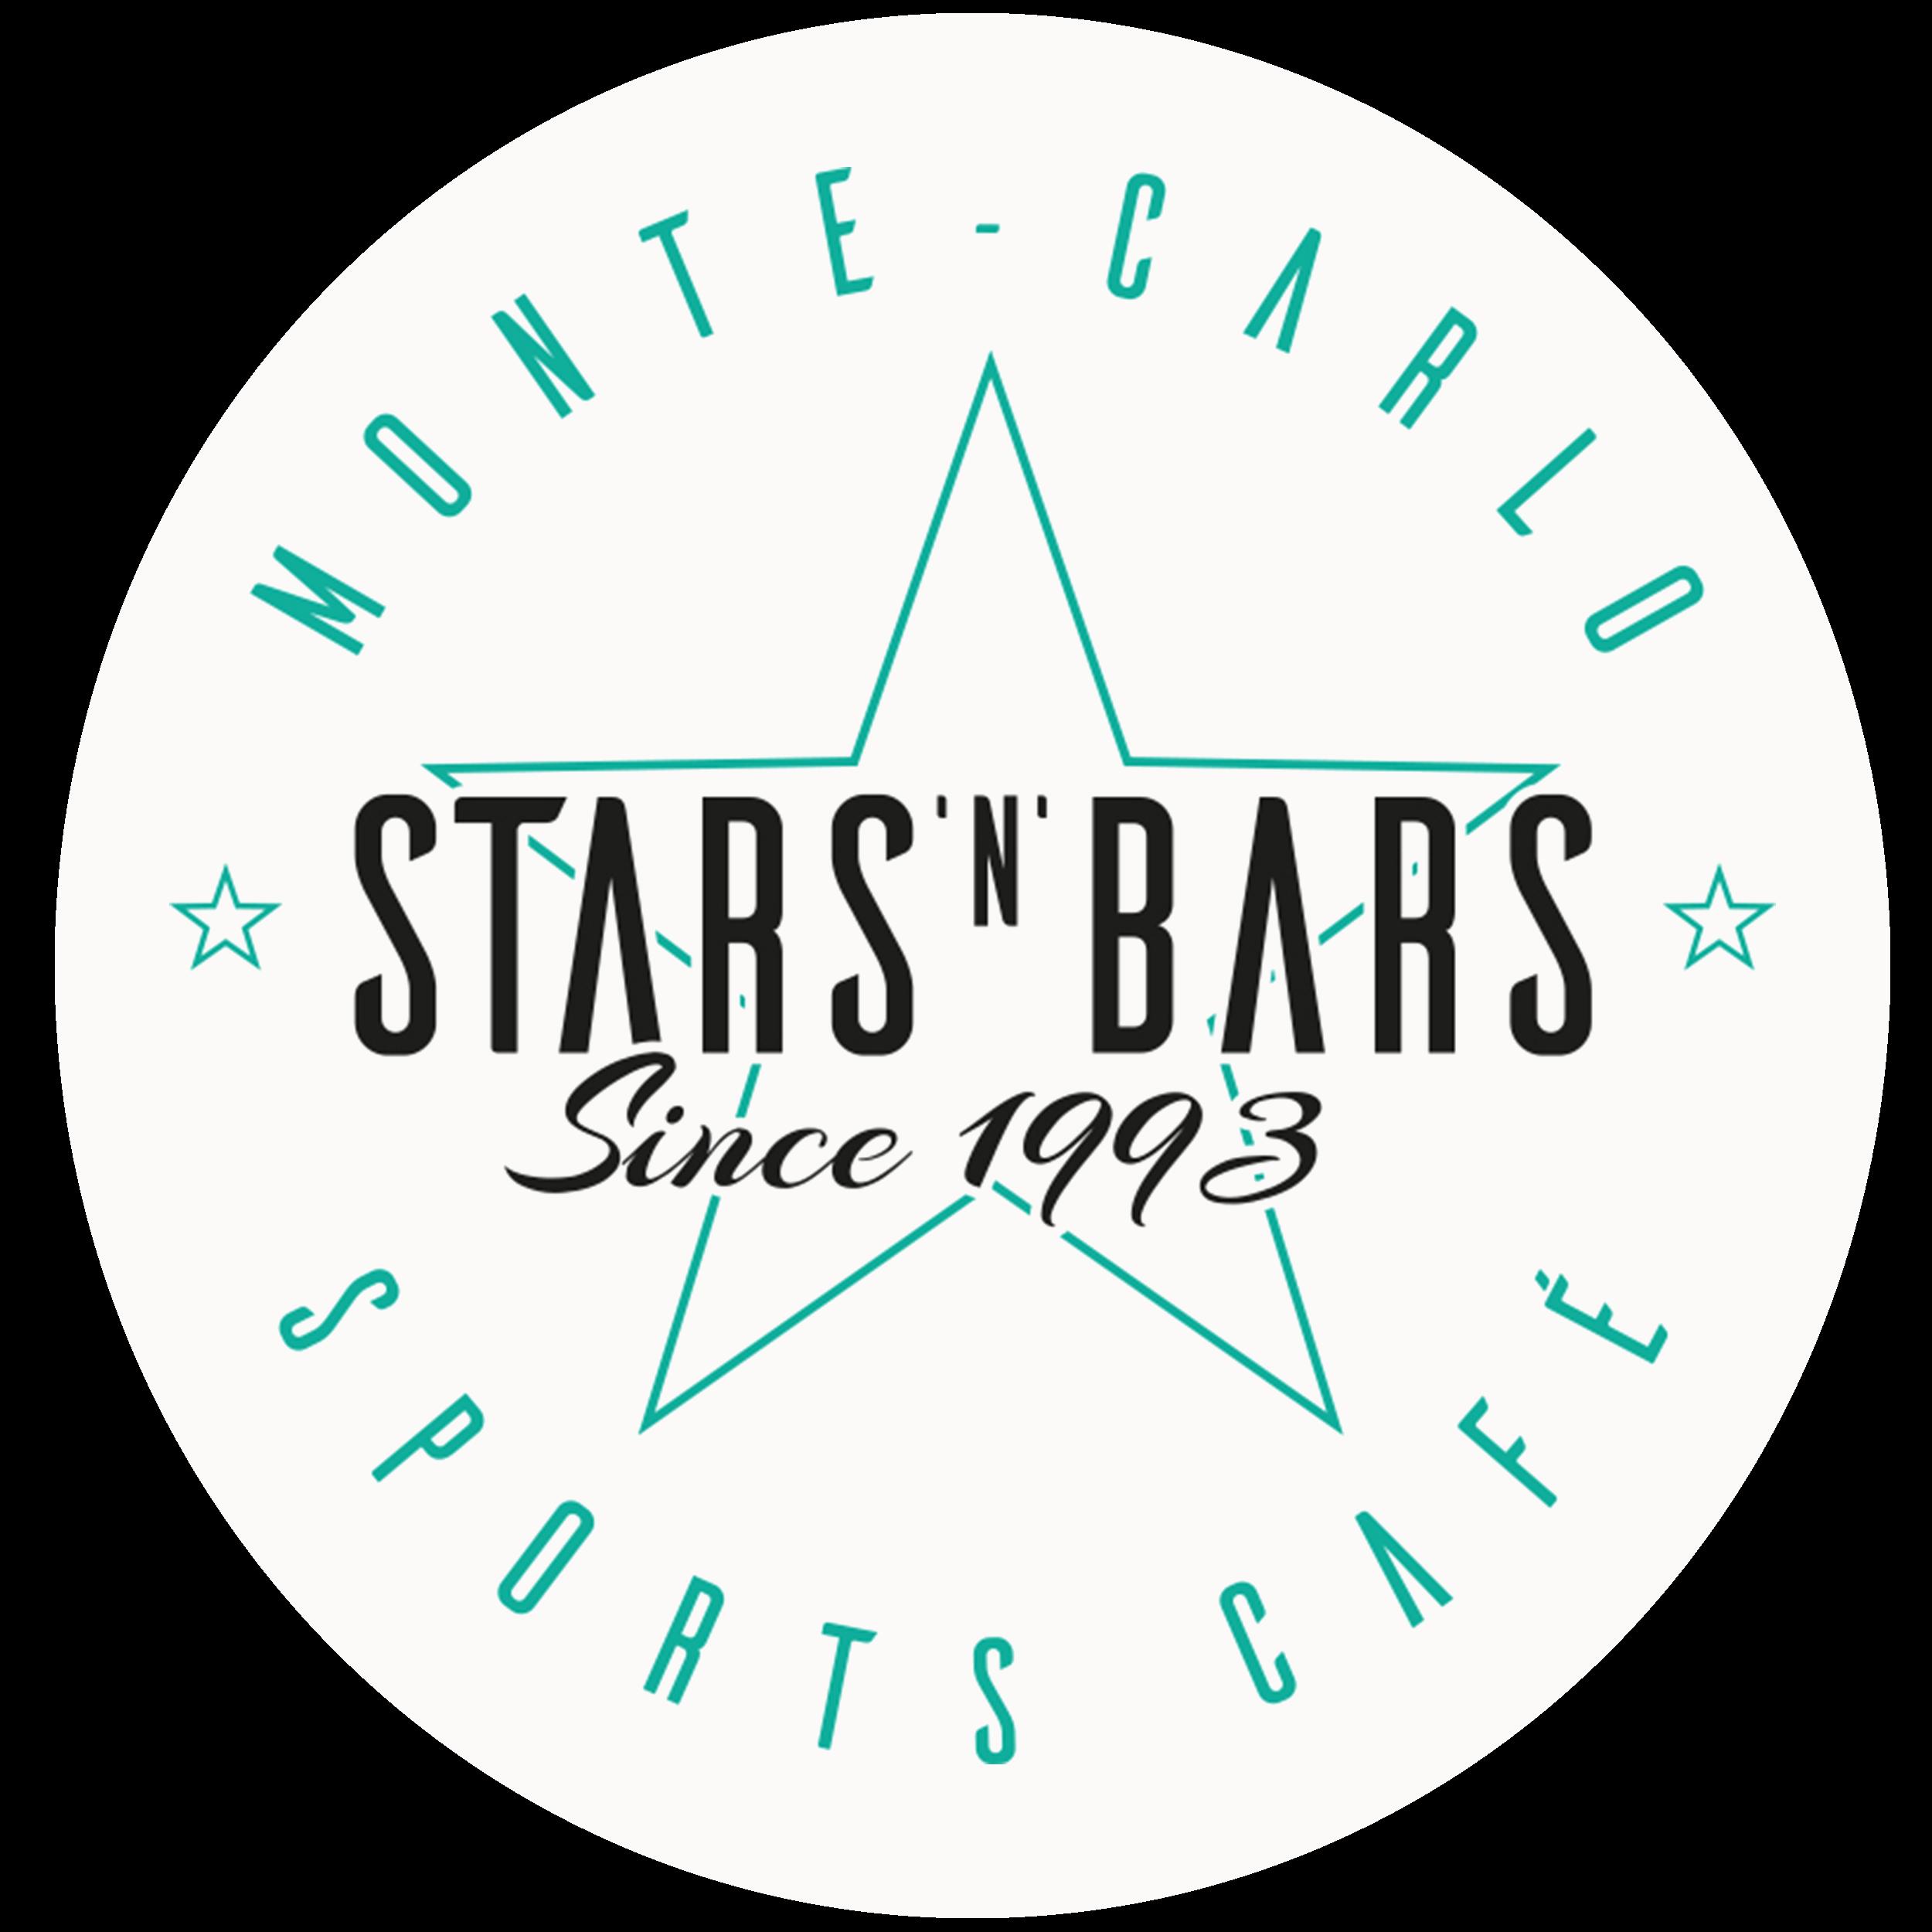 STARSNBARS